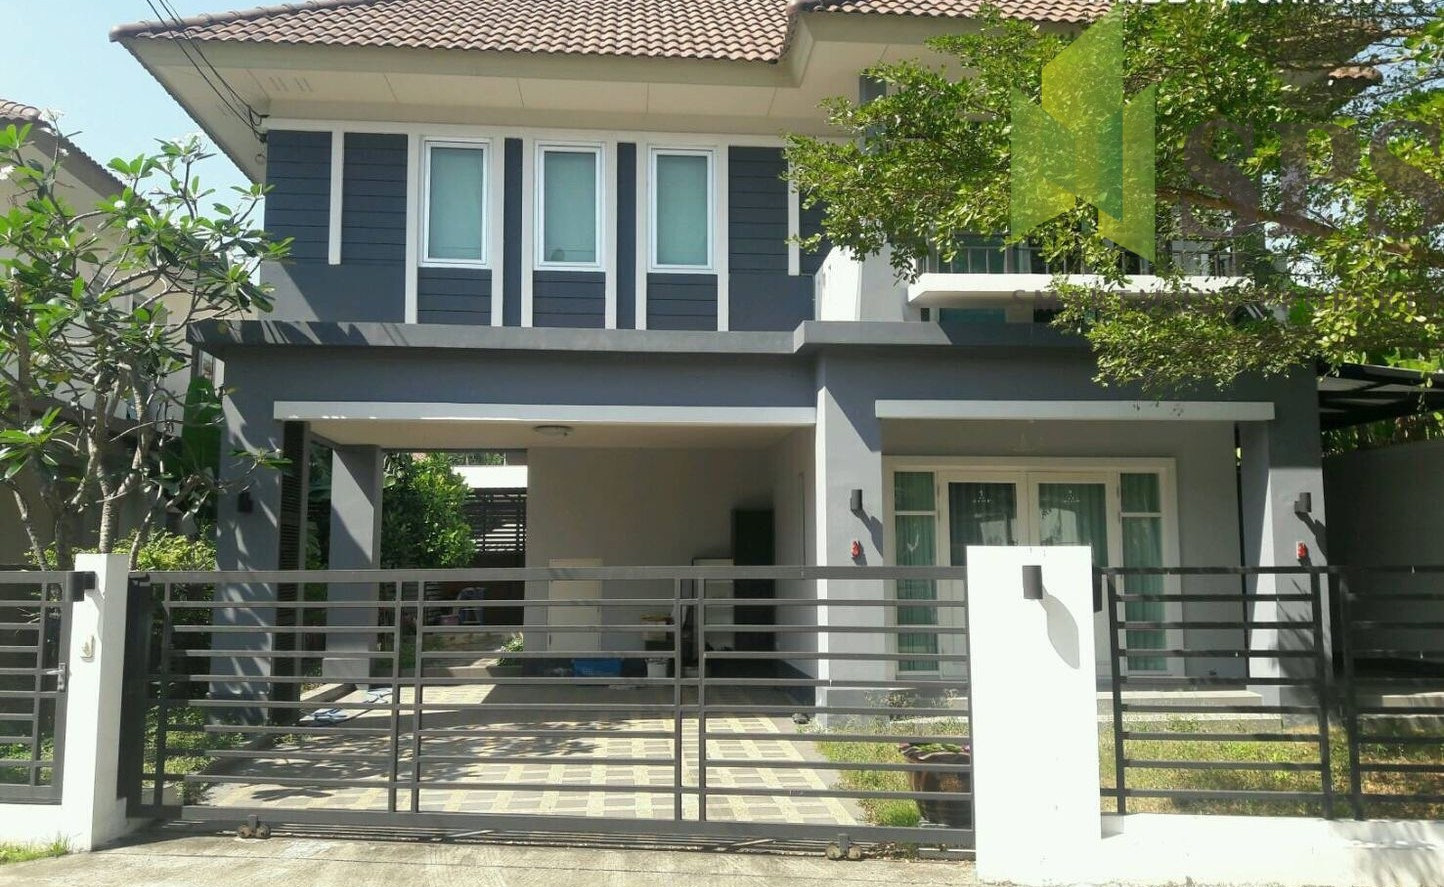 For Rent Single house Atoll Maldives Palms Bangna Wongwan( SPSPE343)